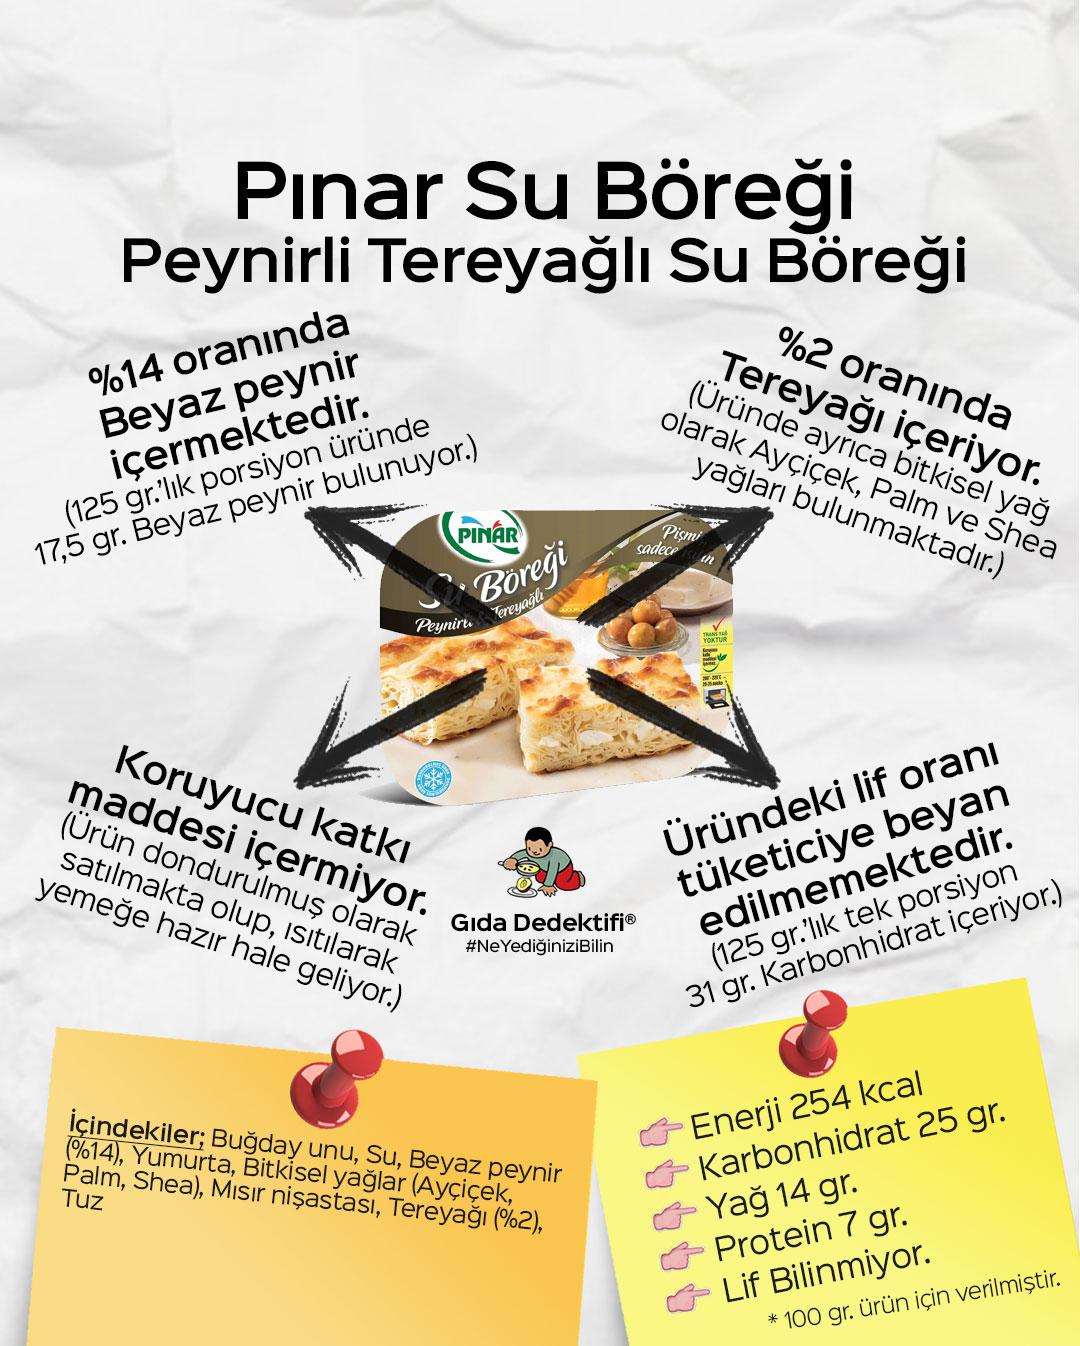 Pınar Su Böreği - Gıda Dedektifi